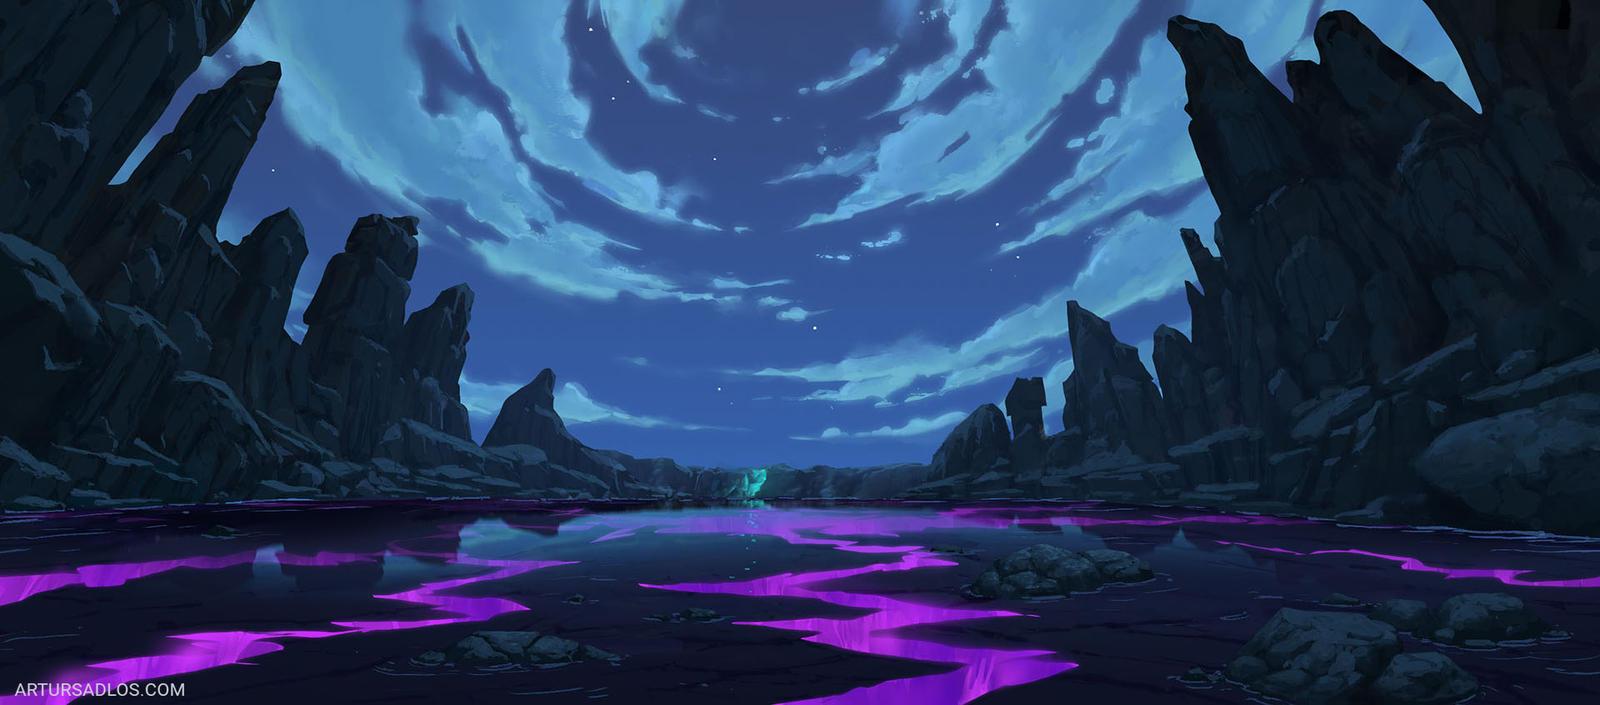 League Of Legends Background Art 2 By Artursadlos On Deviantart